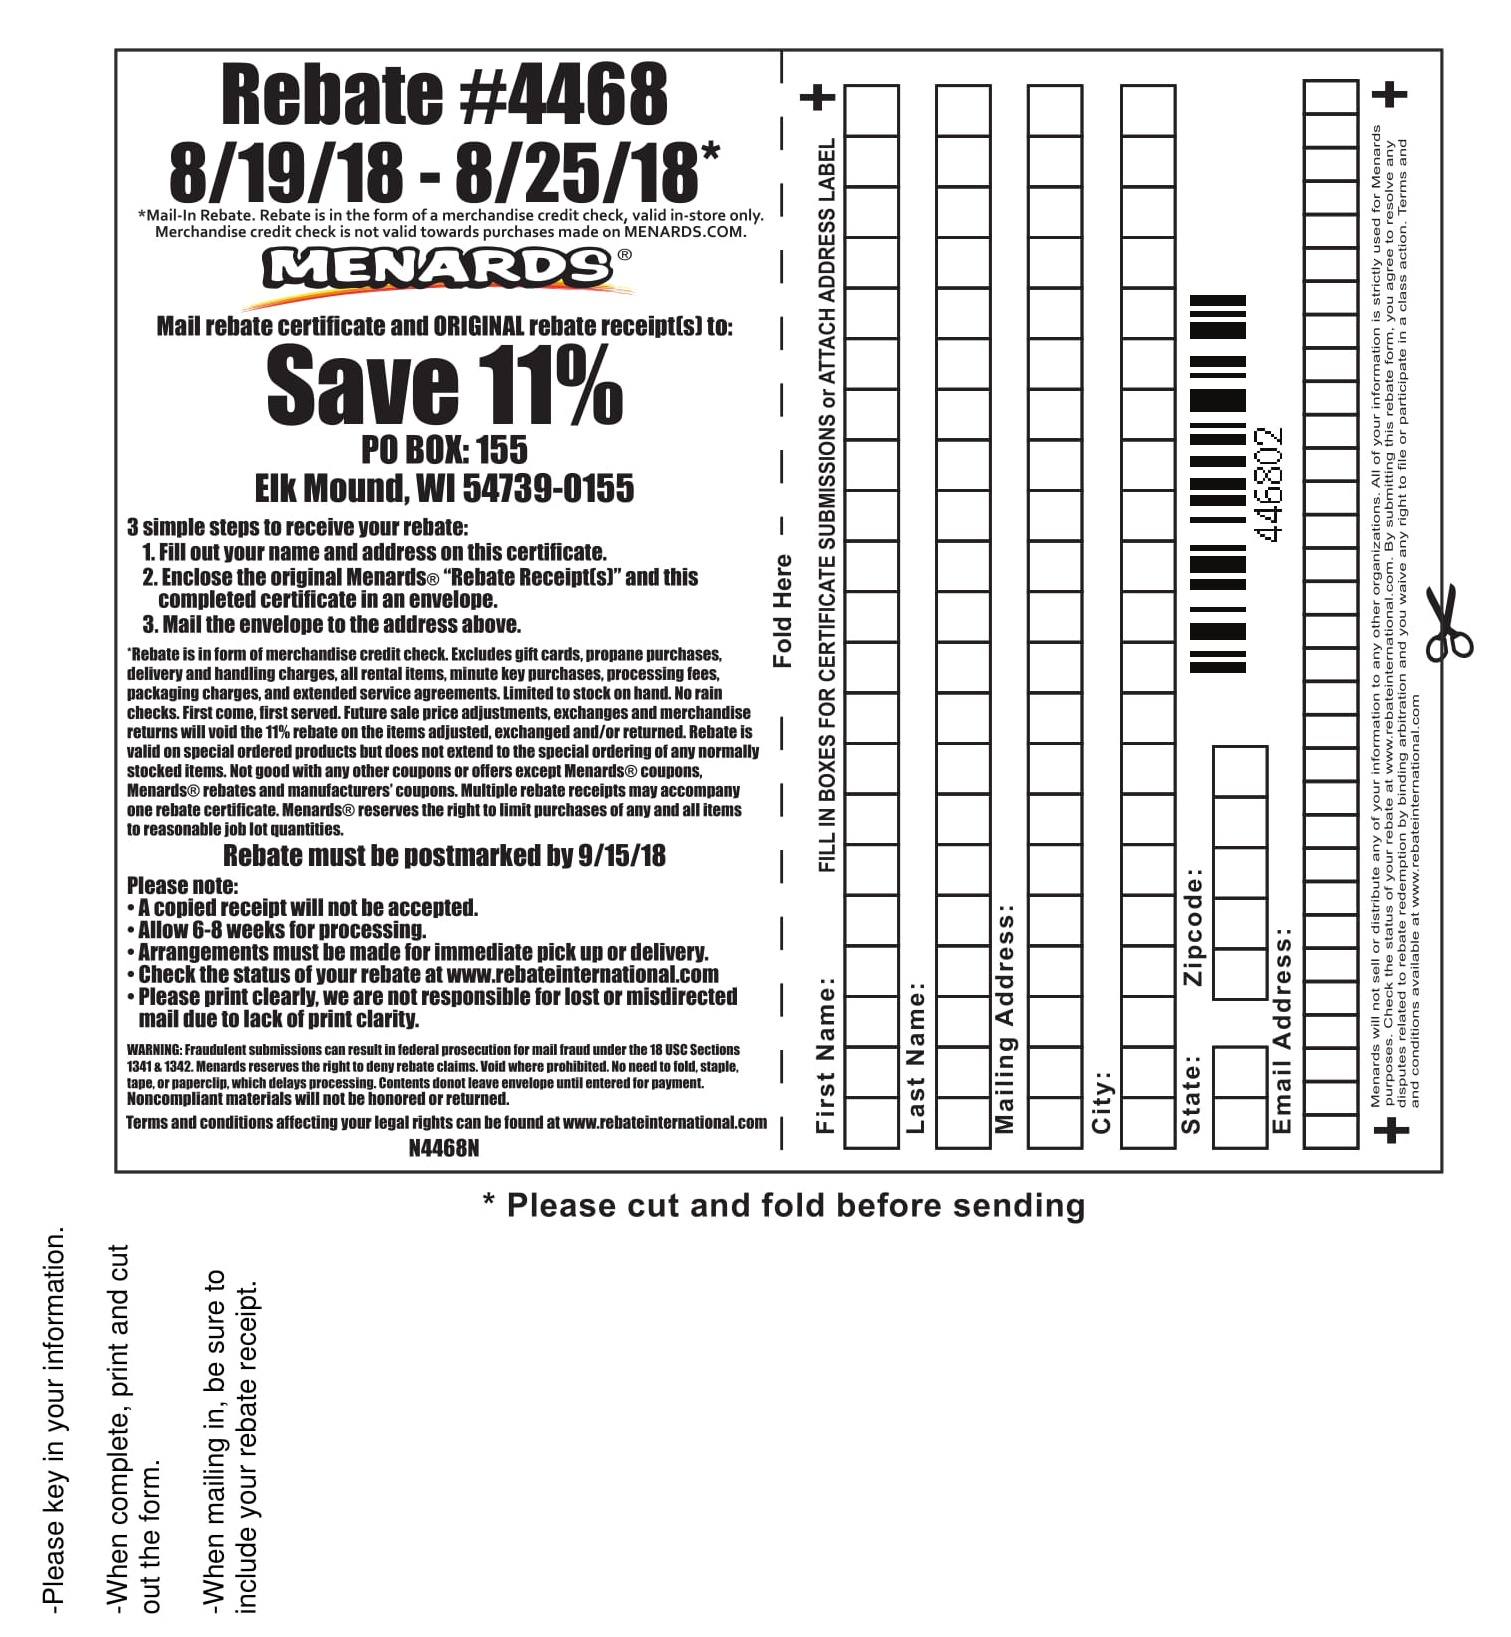 Menards 11 Rebate Form For Prior Purchases